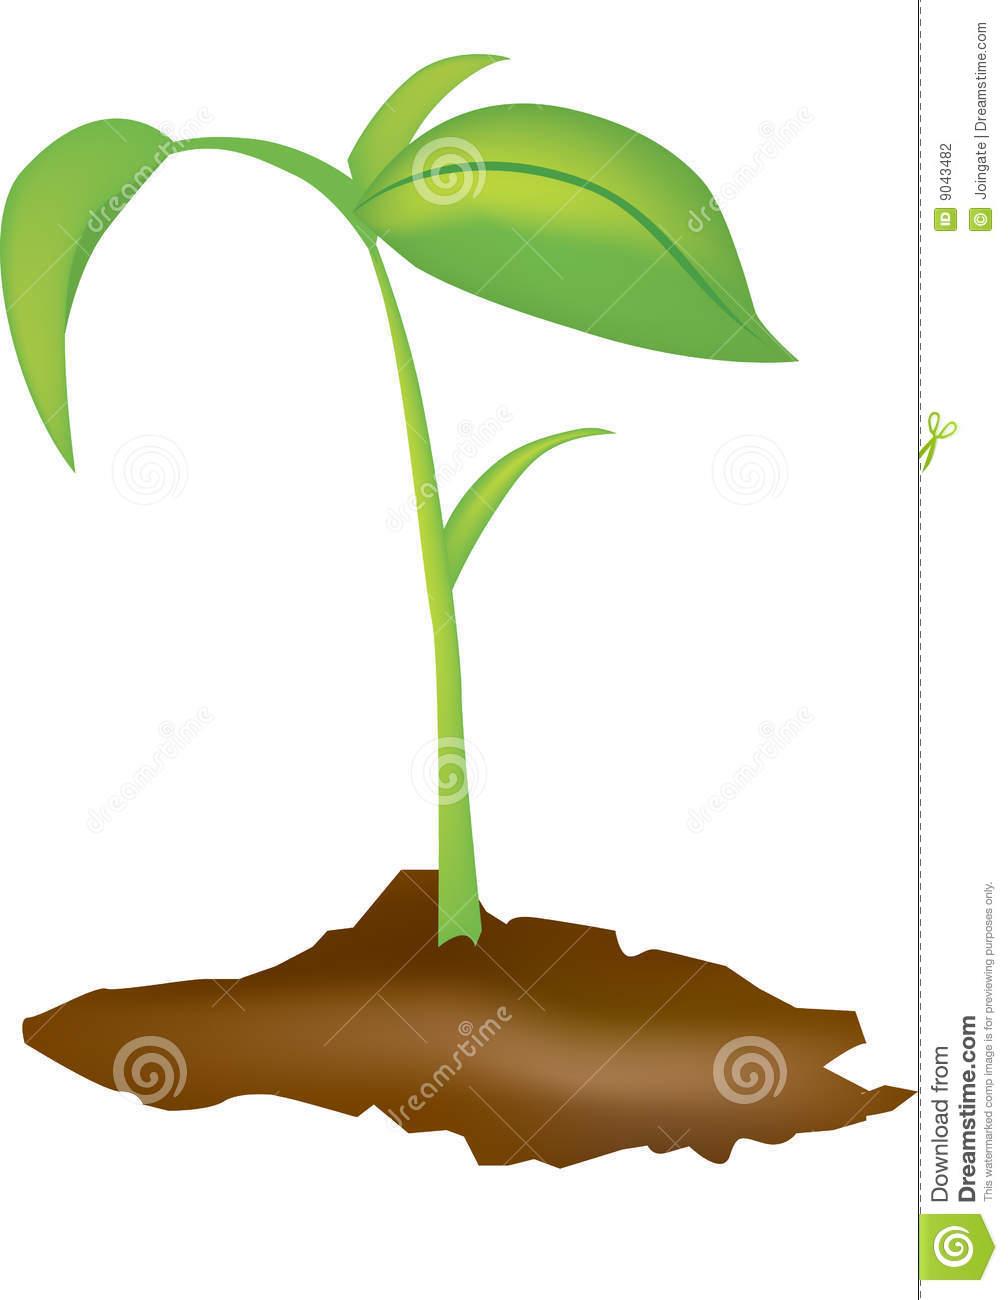 Clipart seedling clipart freeuse Seedling | Clipart Panda - Free Clipart Images clipart freeuse